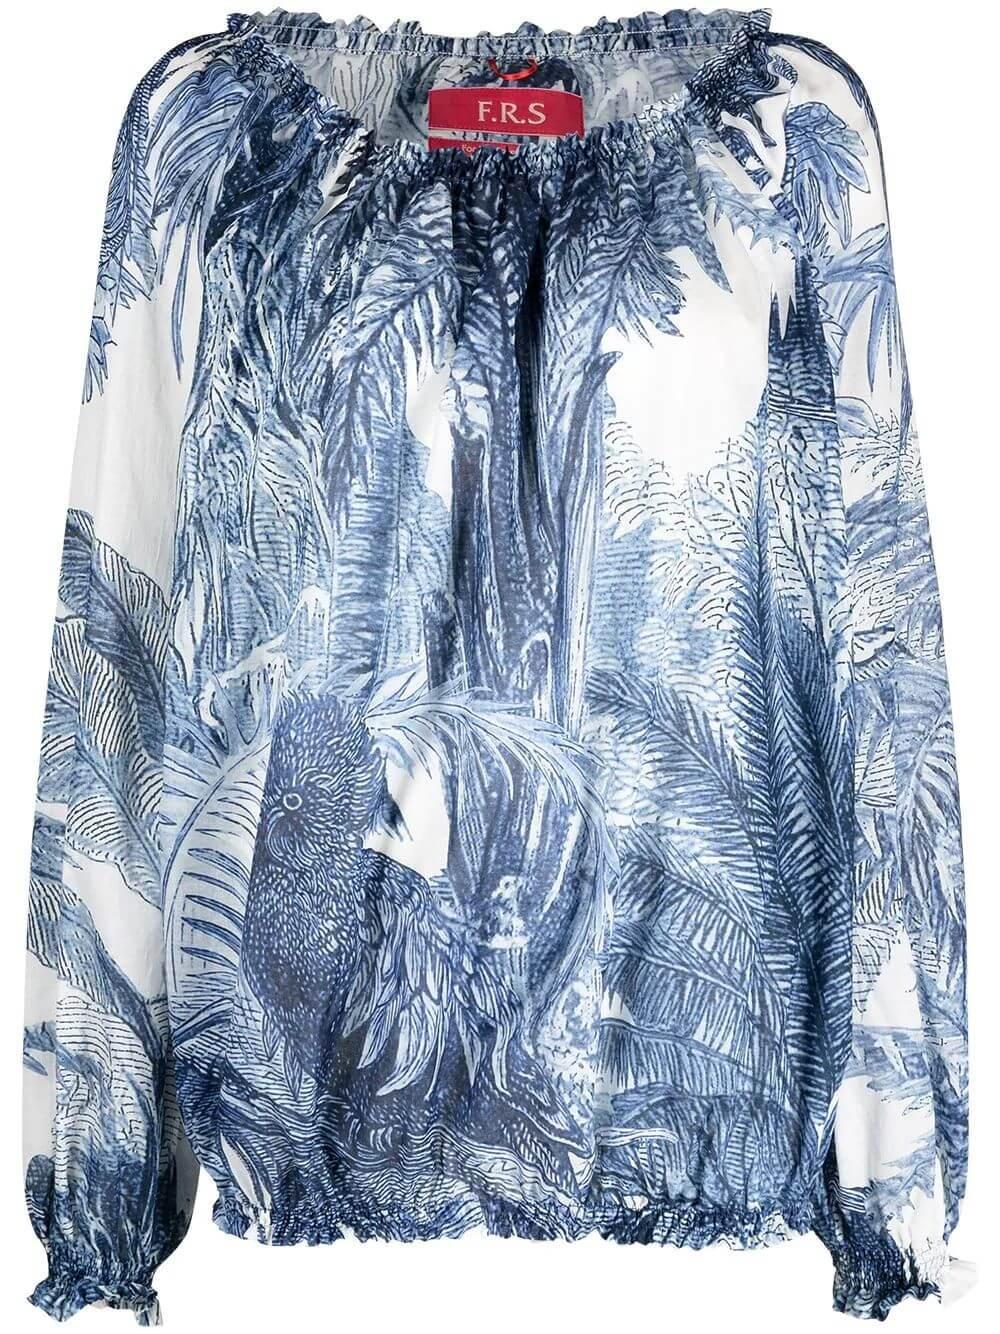 Foliage Printed Cotton Top Item # CA000190-TE00538-179